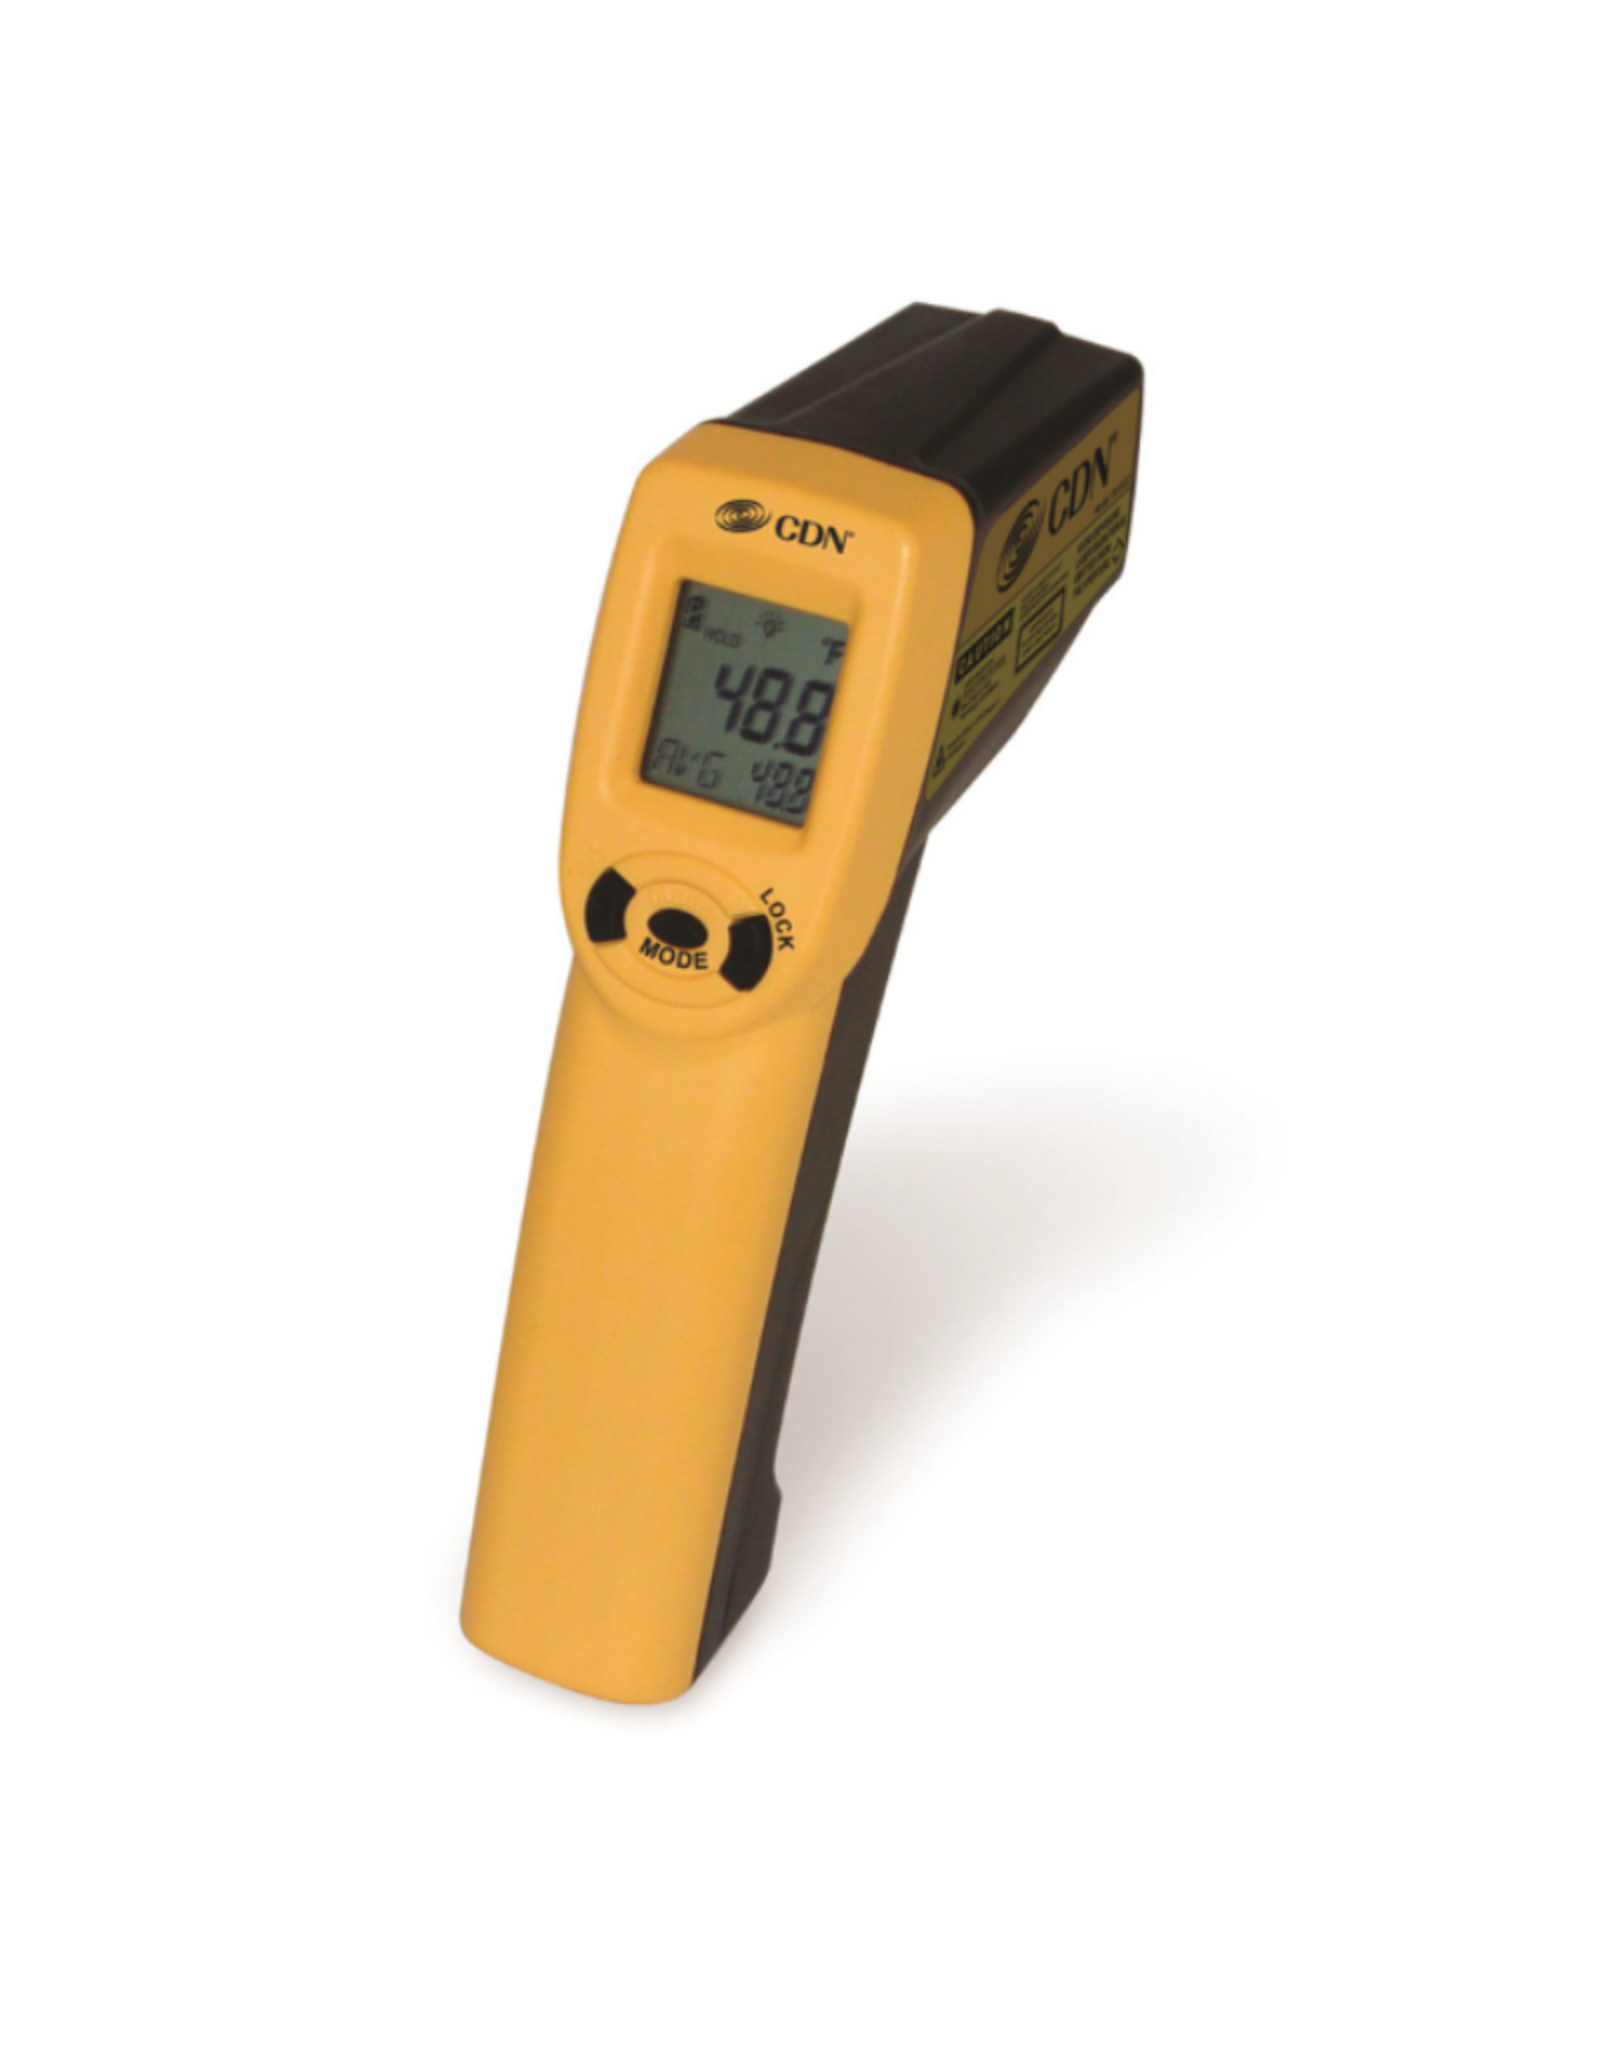 Thermomètre infrarouge CDN